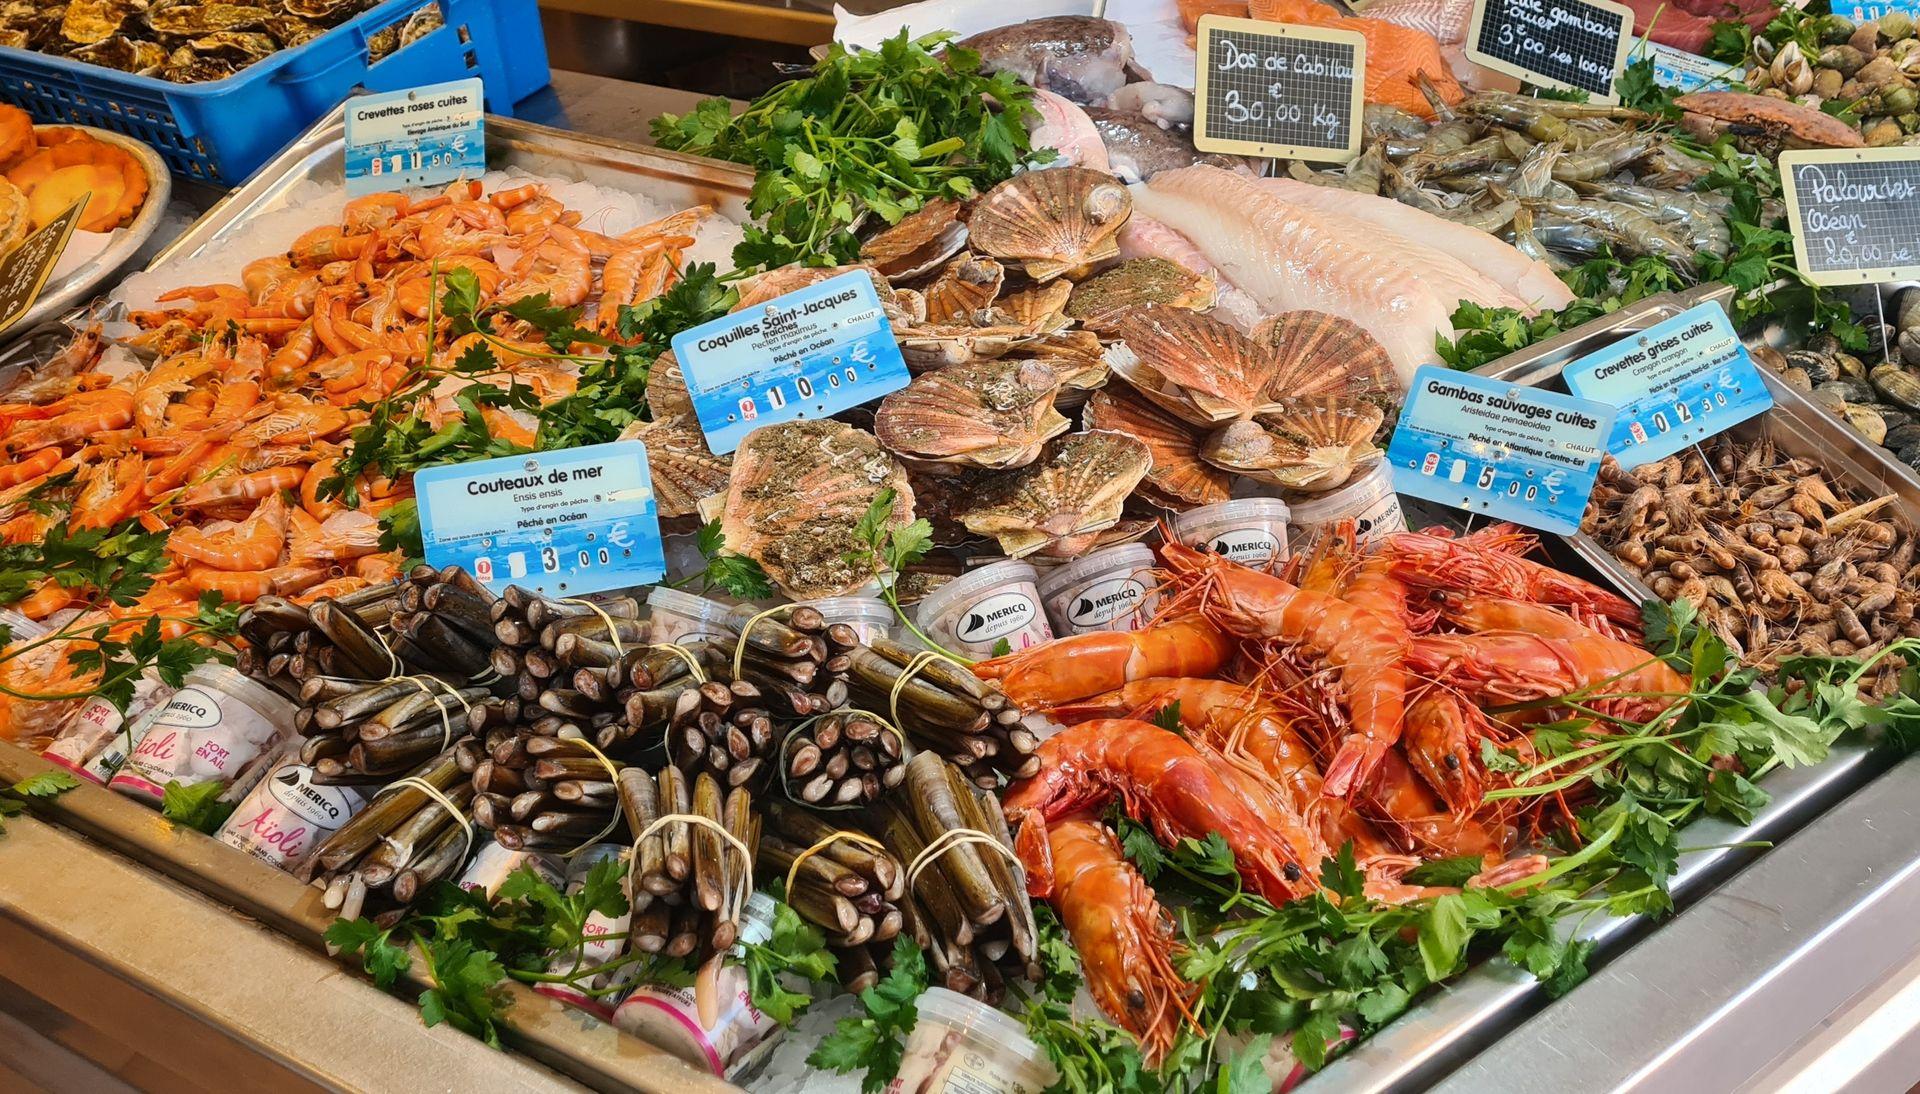 Etal de fruits de mer à L'Odacieuse Vidal coquillages à Valras